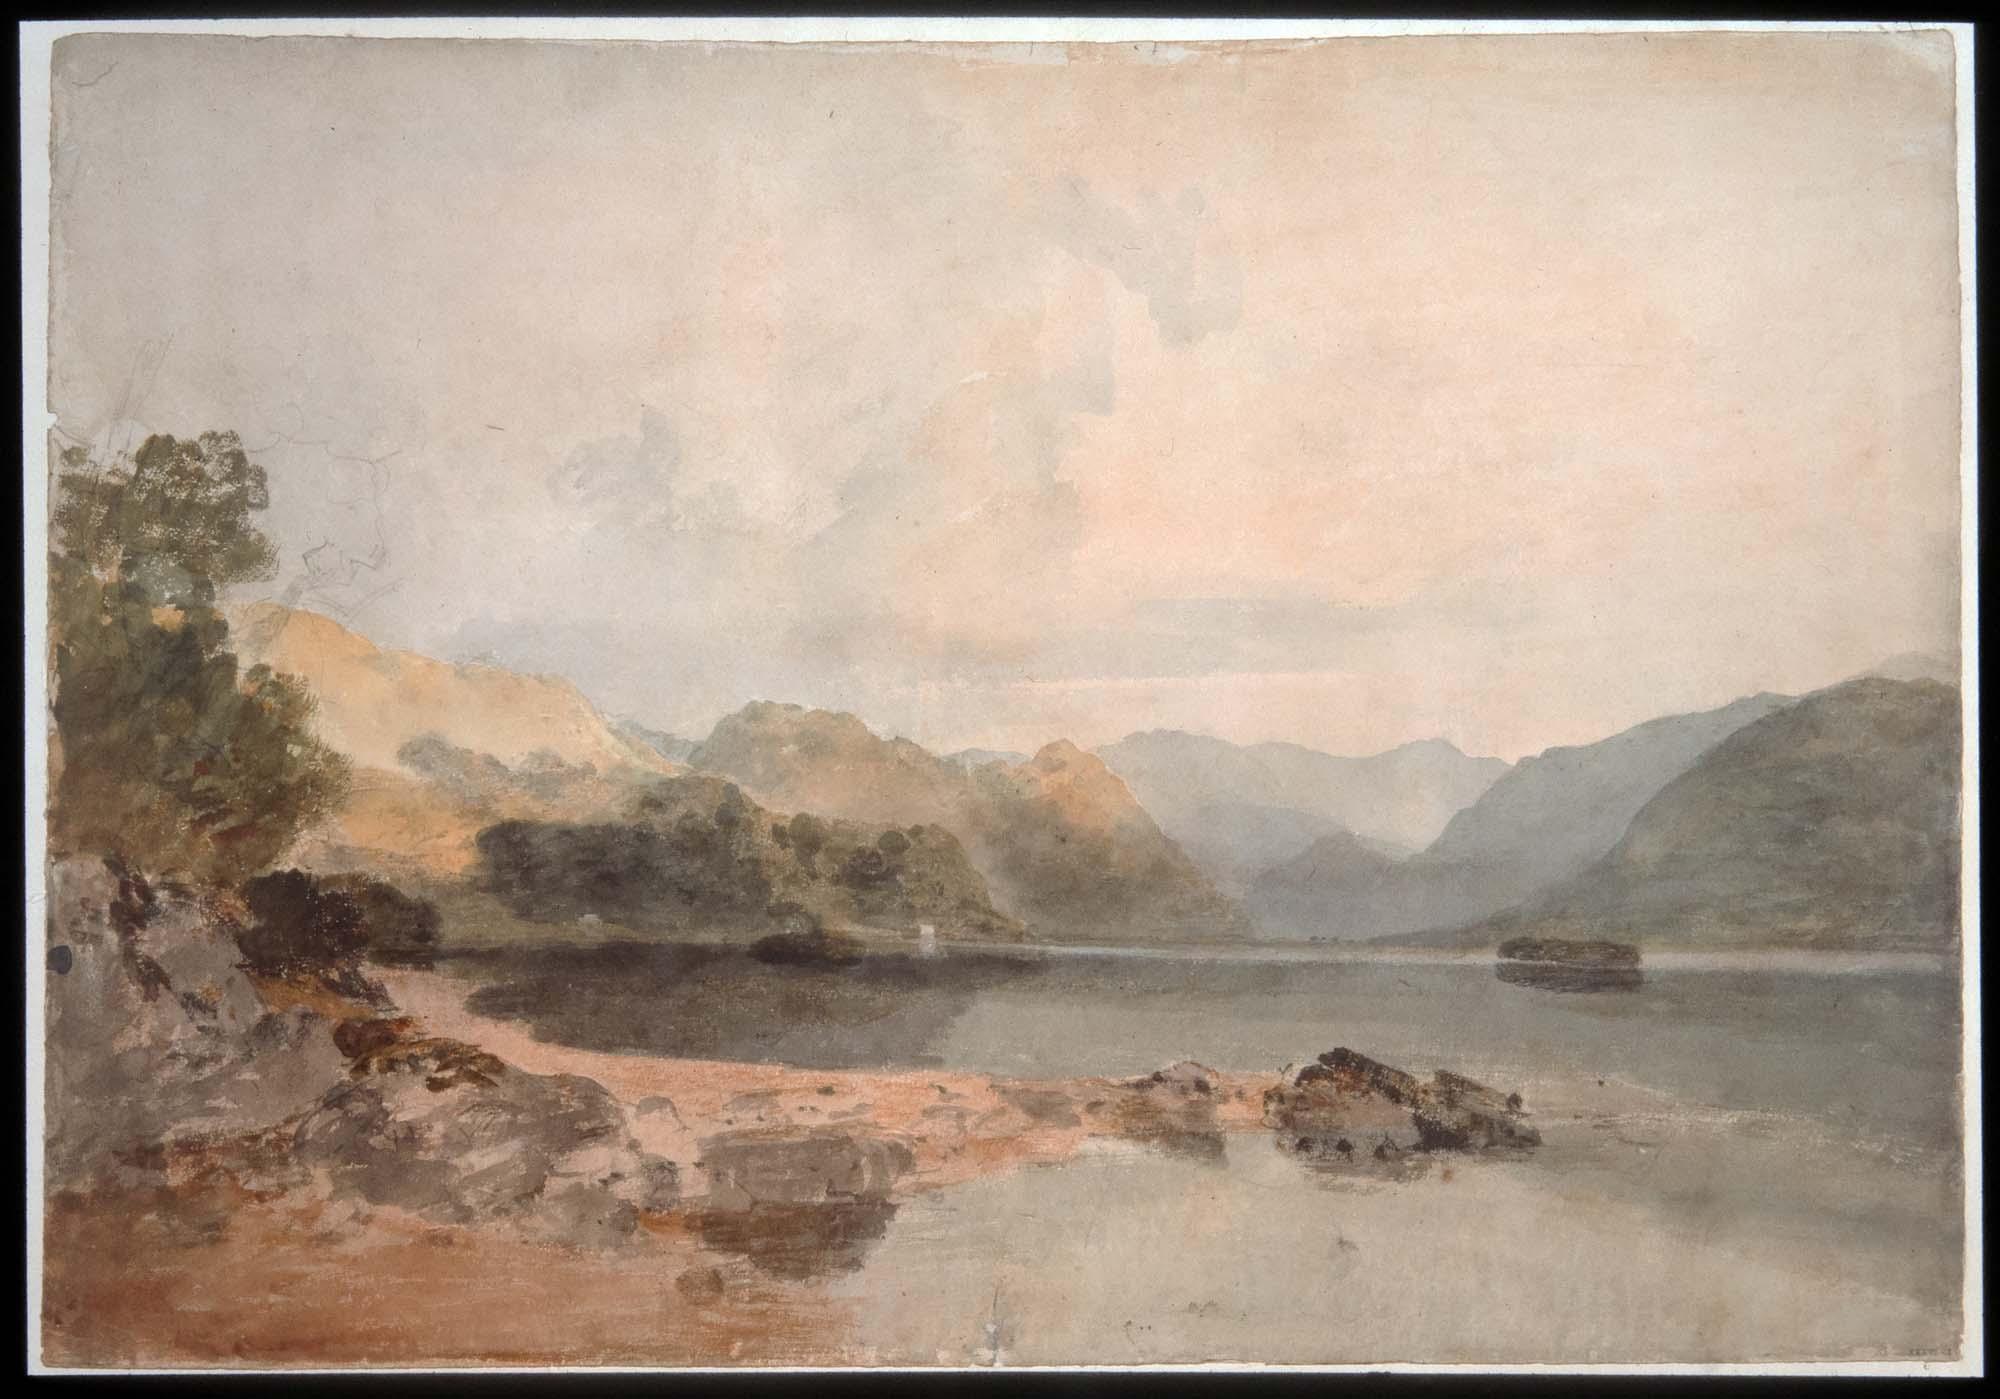 a watercolour looking across a lake